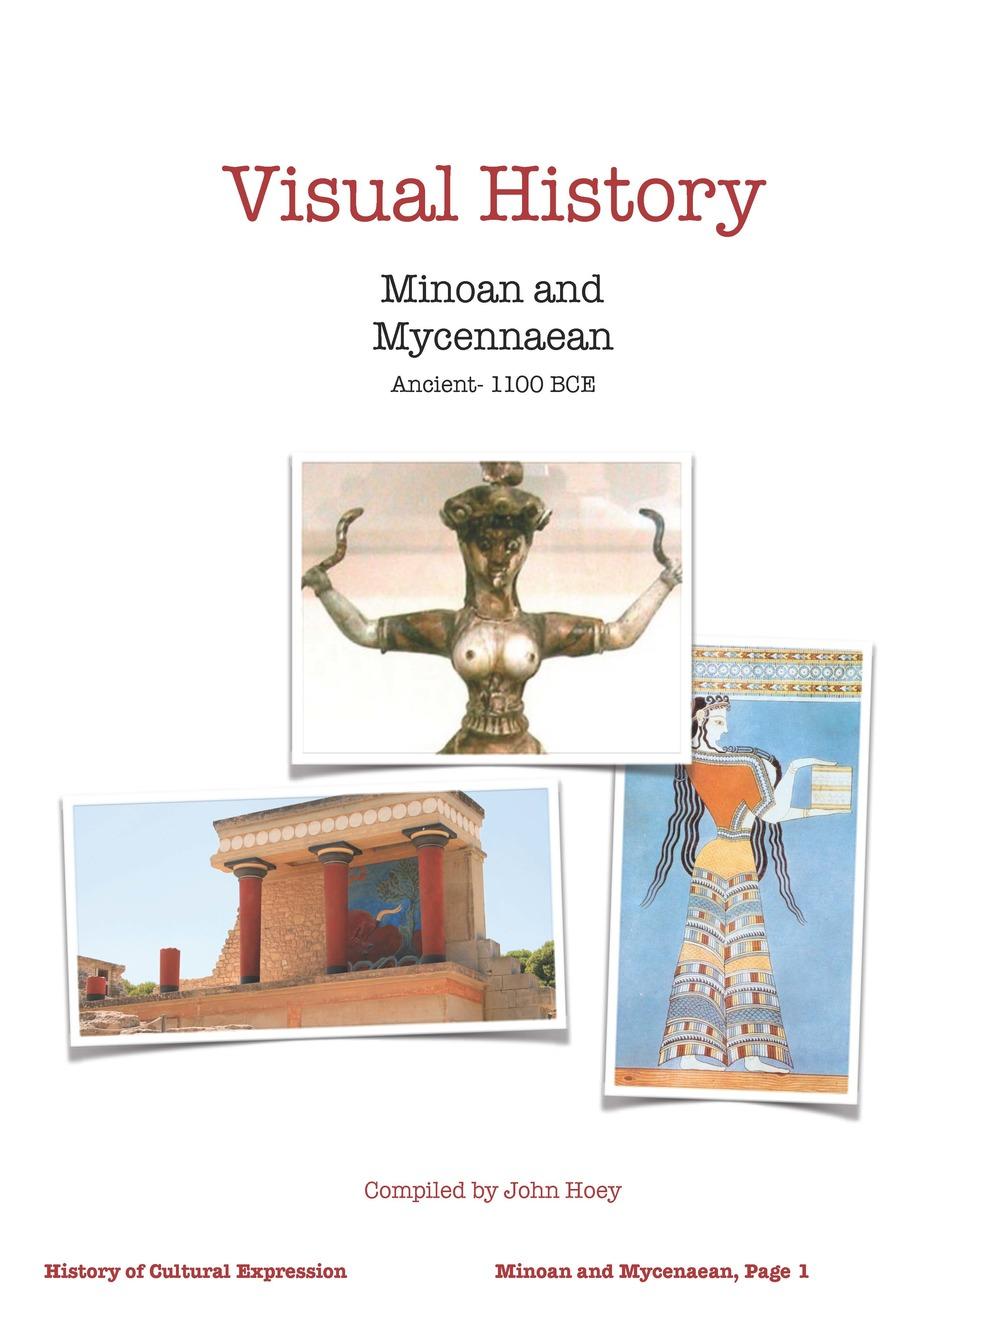 HOCE Minoan-Mycannaean- Study Guide_Page_1.jpg